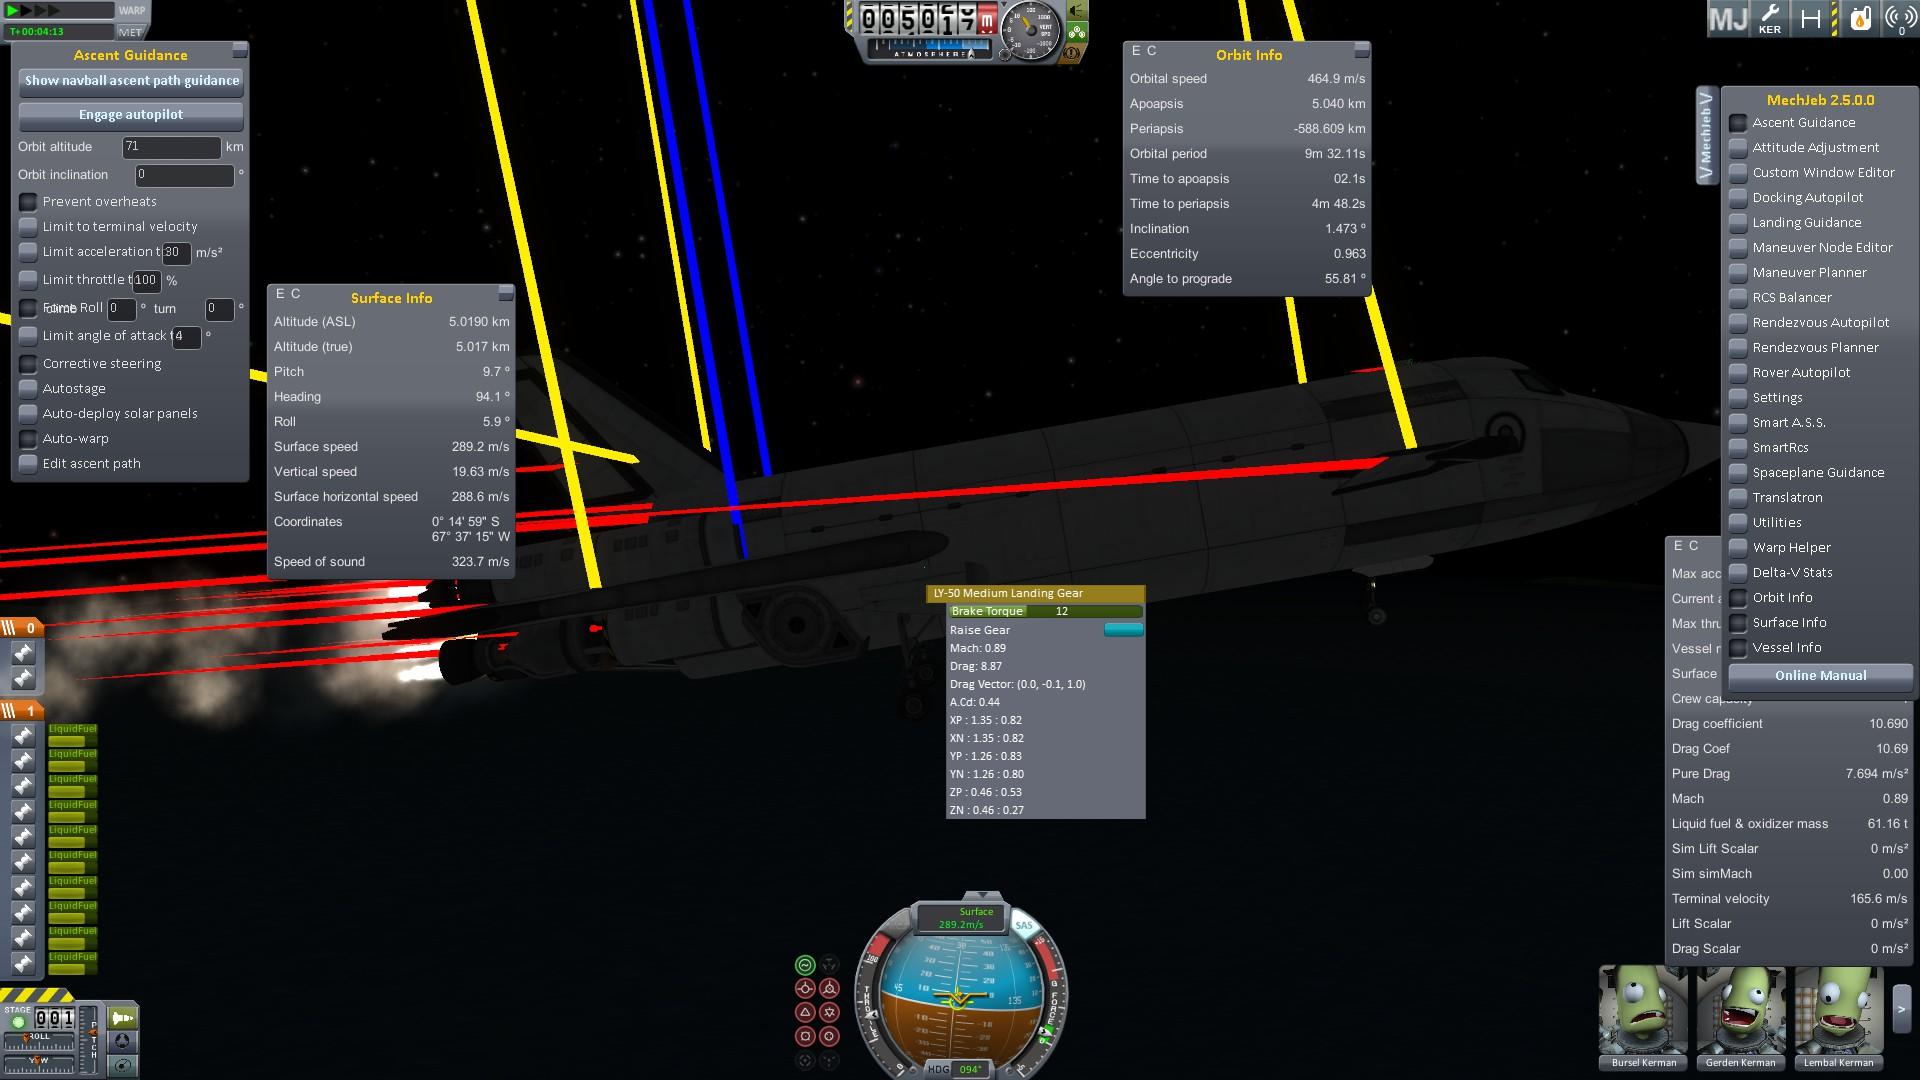 kerbal space program bugs - photo #6